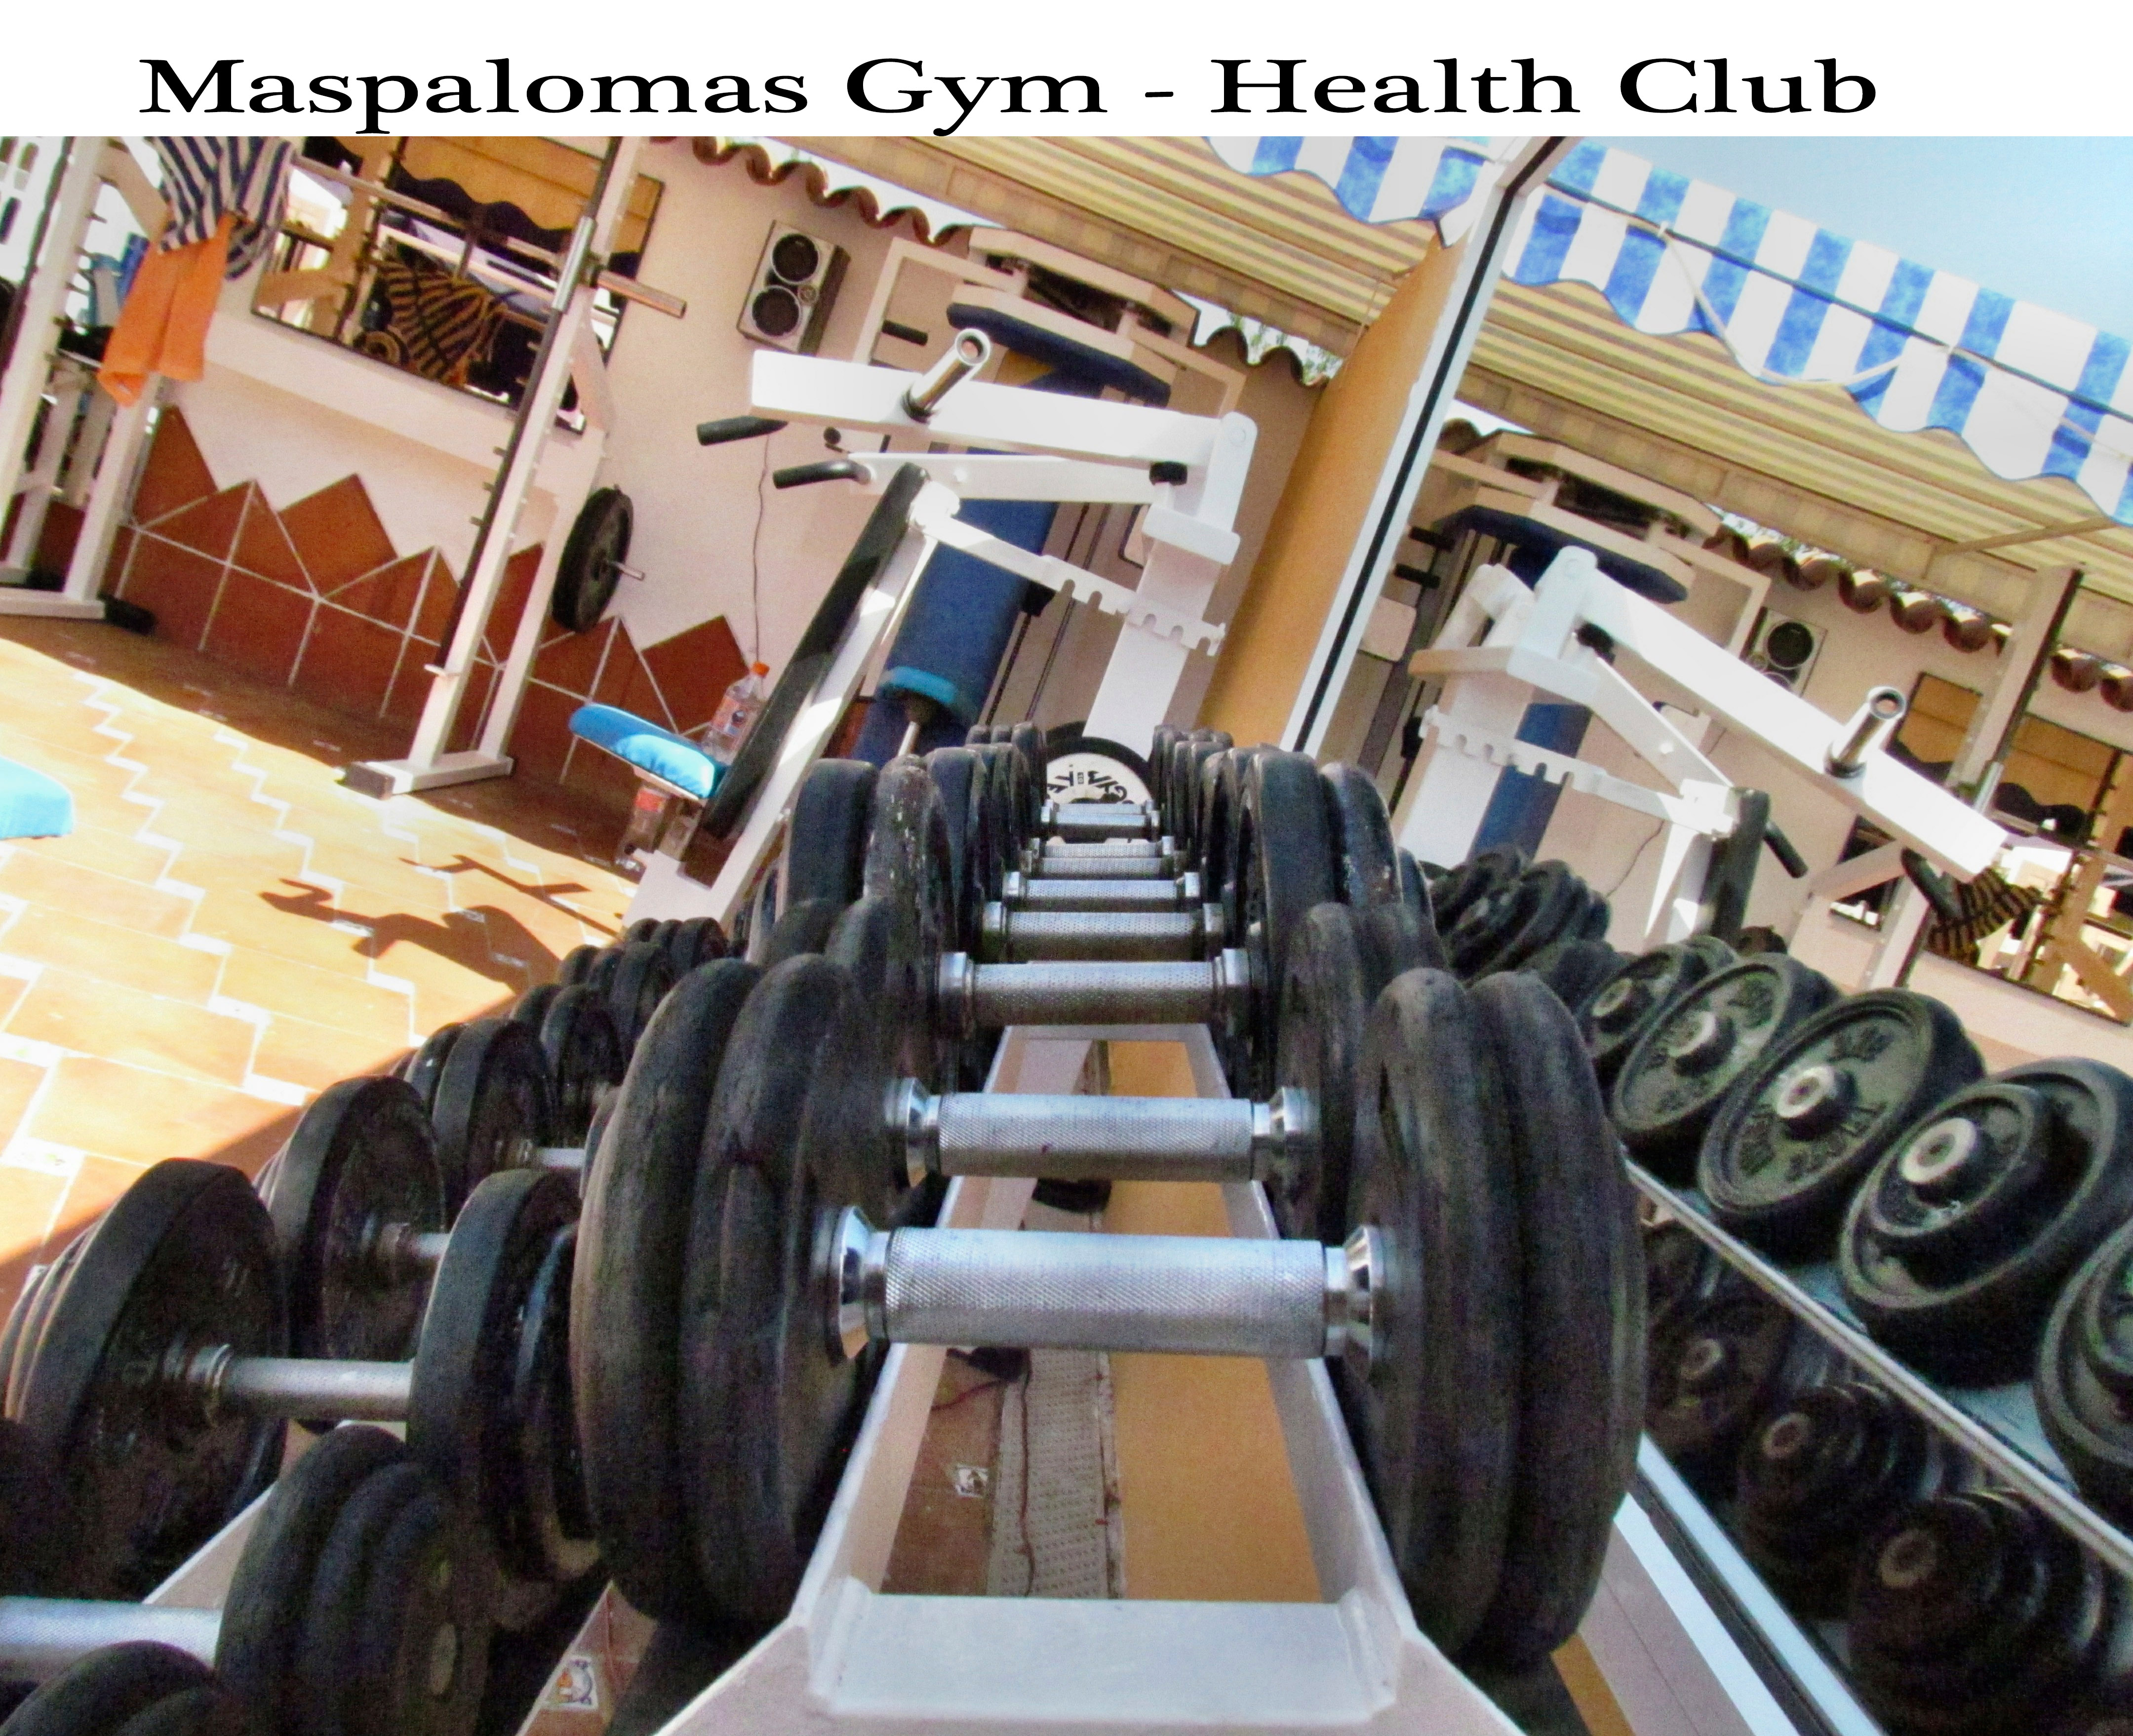 maspalomas gym health club gran canaria